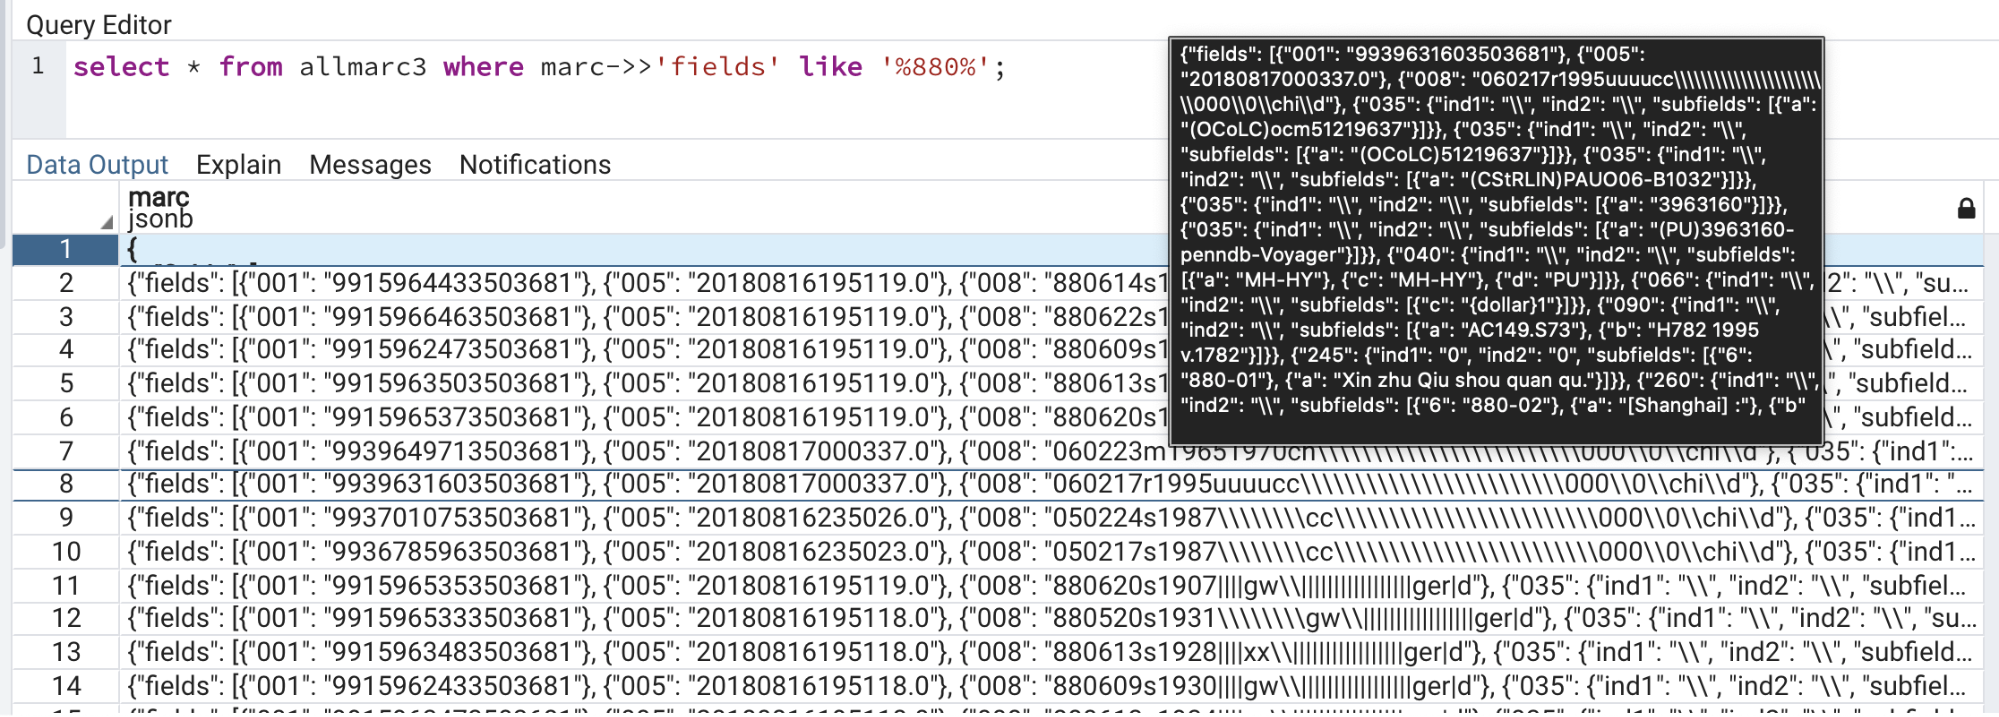 Figure 11. Retrieval of JSONb enriched MARC records through a PostgreSQL keyword query. Source: pgAdmin 4